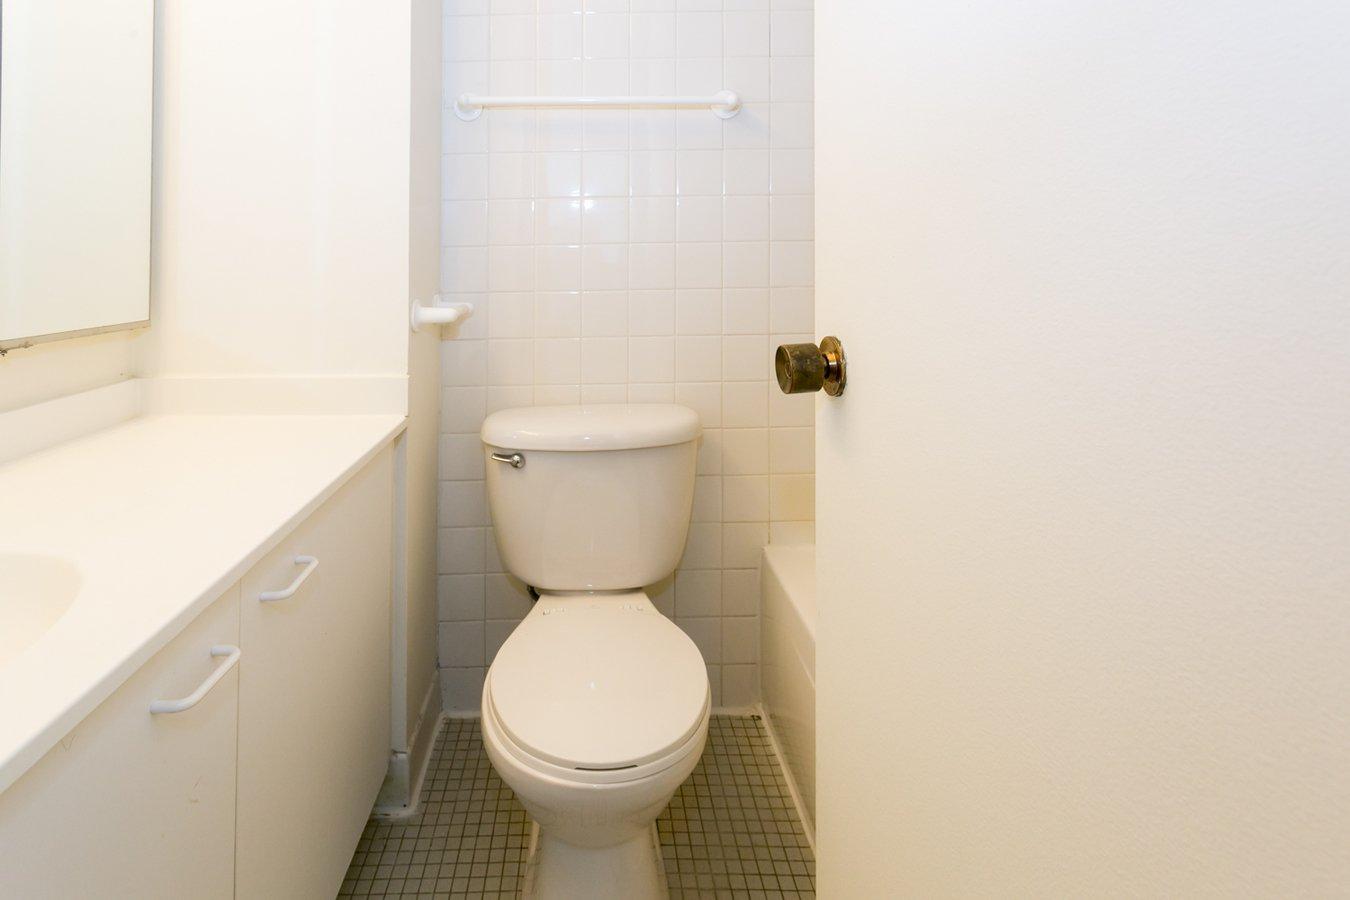 Studio 1 Bathroom Apartment for rent at Regents Park in Chicago, IL